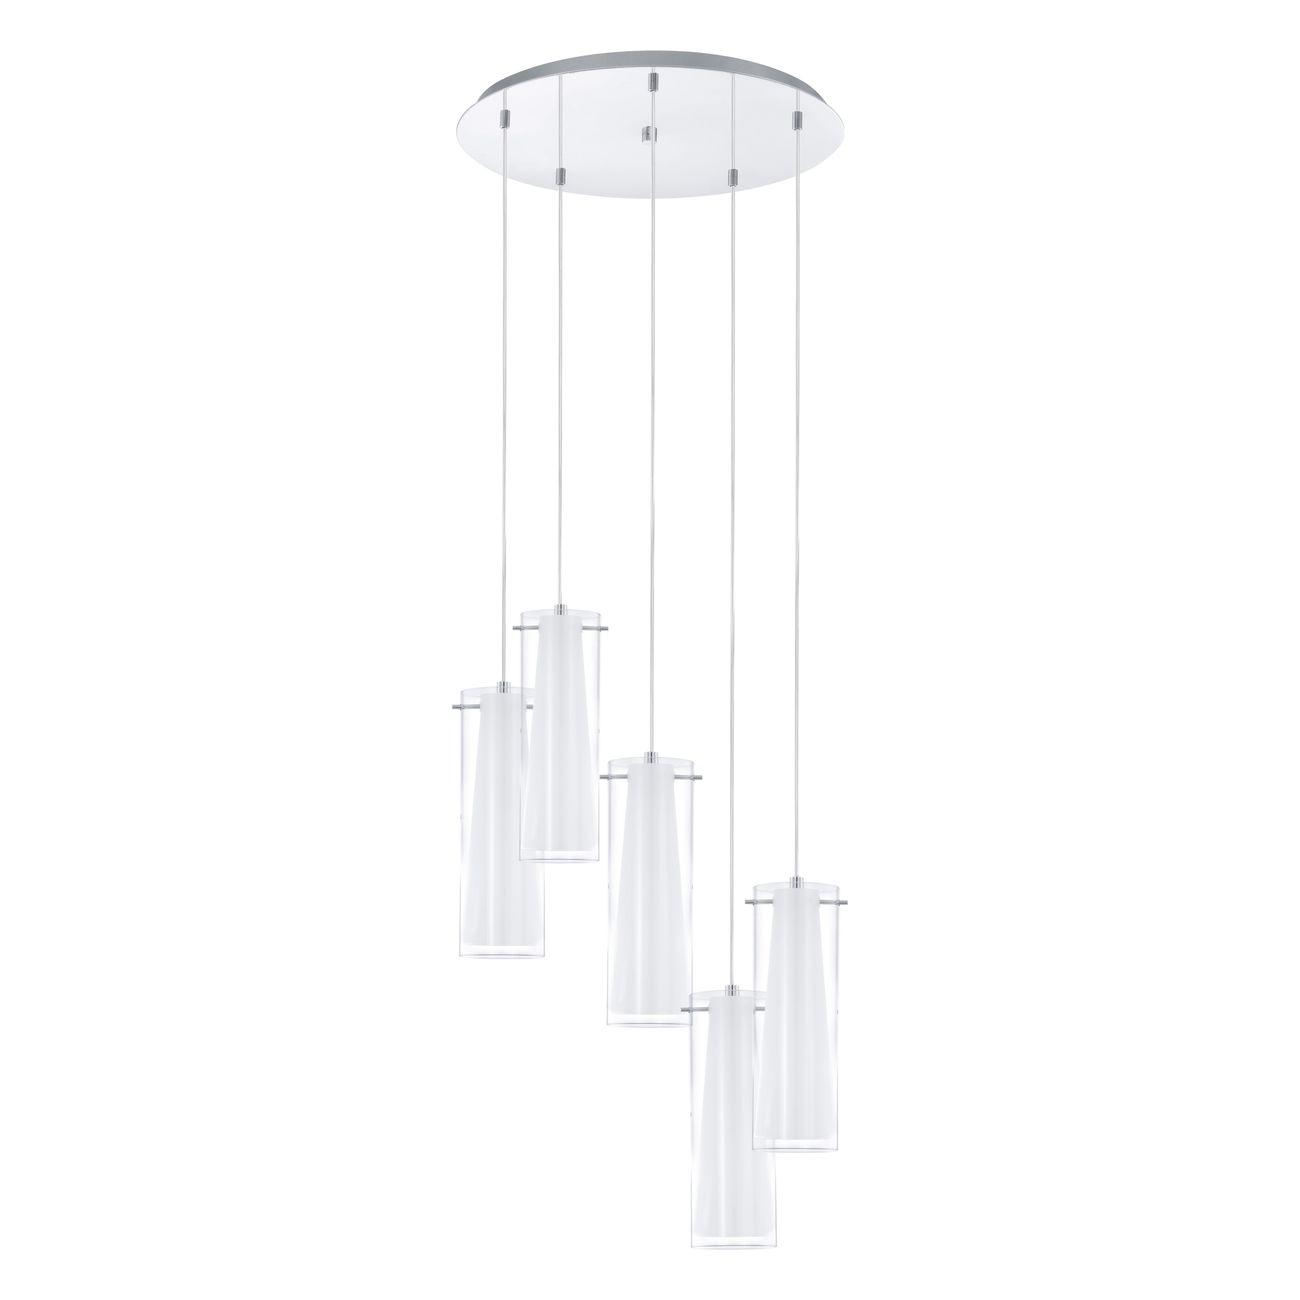 Svítidlo závěsné PINTO 5×E27 chrom/čiré a opálové bílé sklo